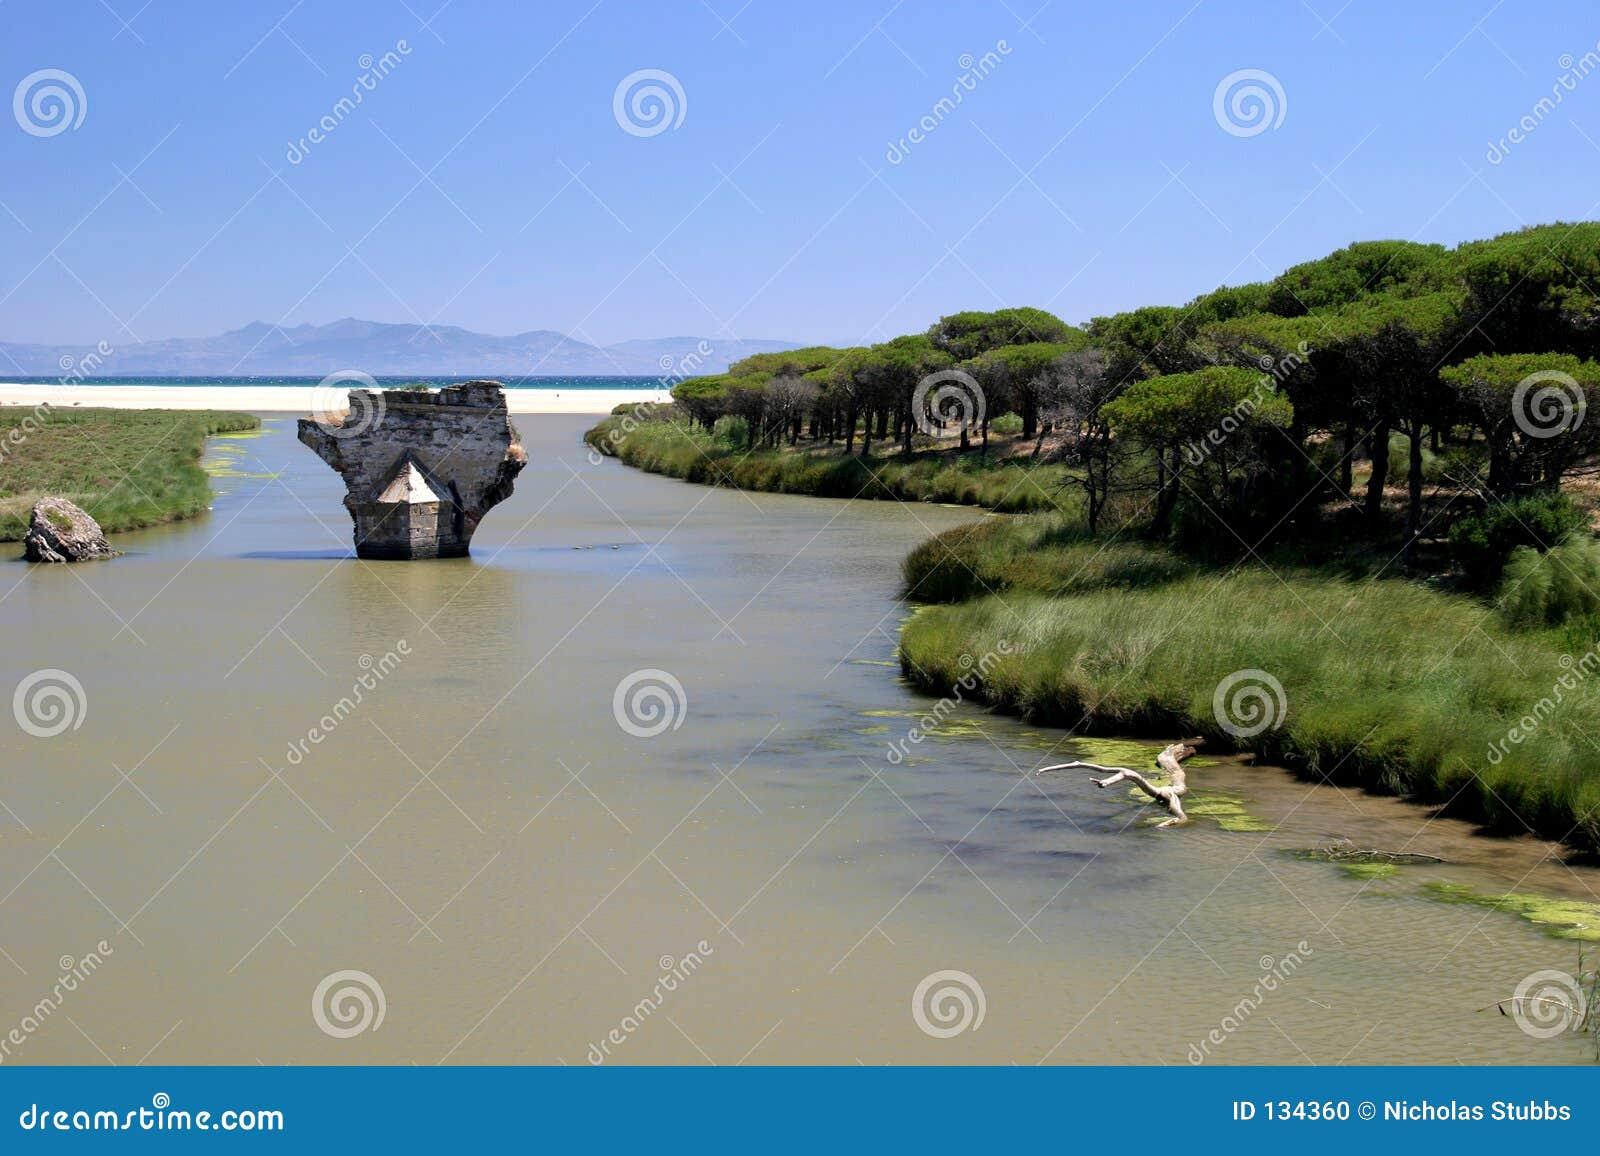 Stary most do rzeki morski sunny Hiszpanii